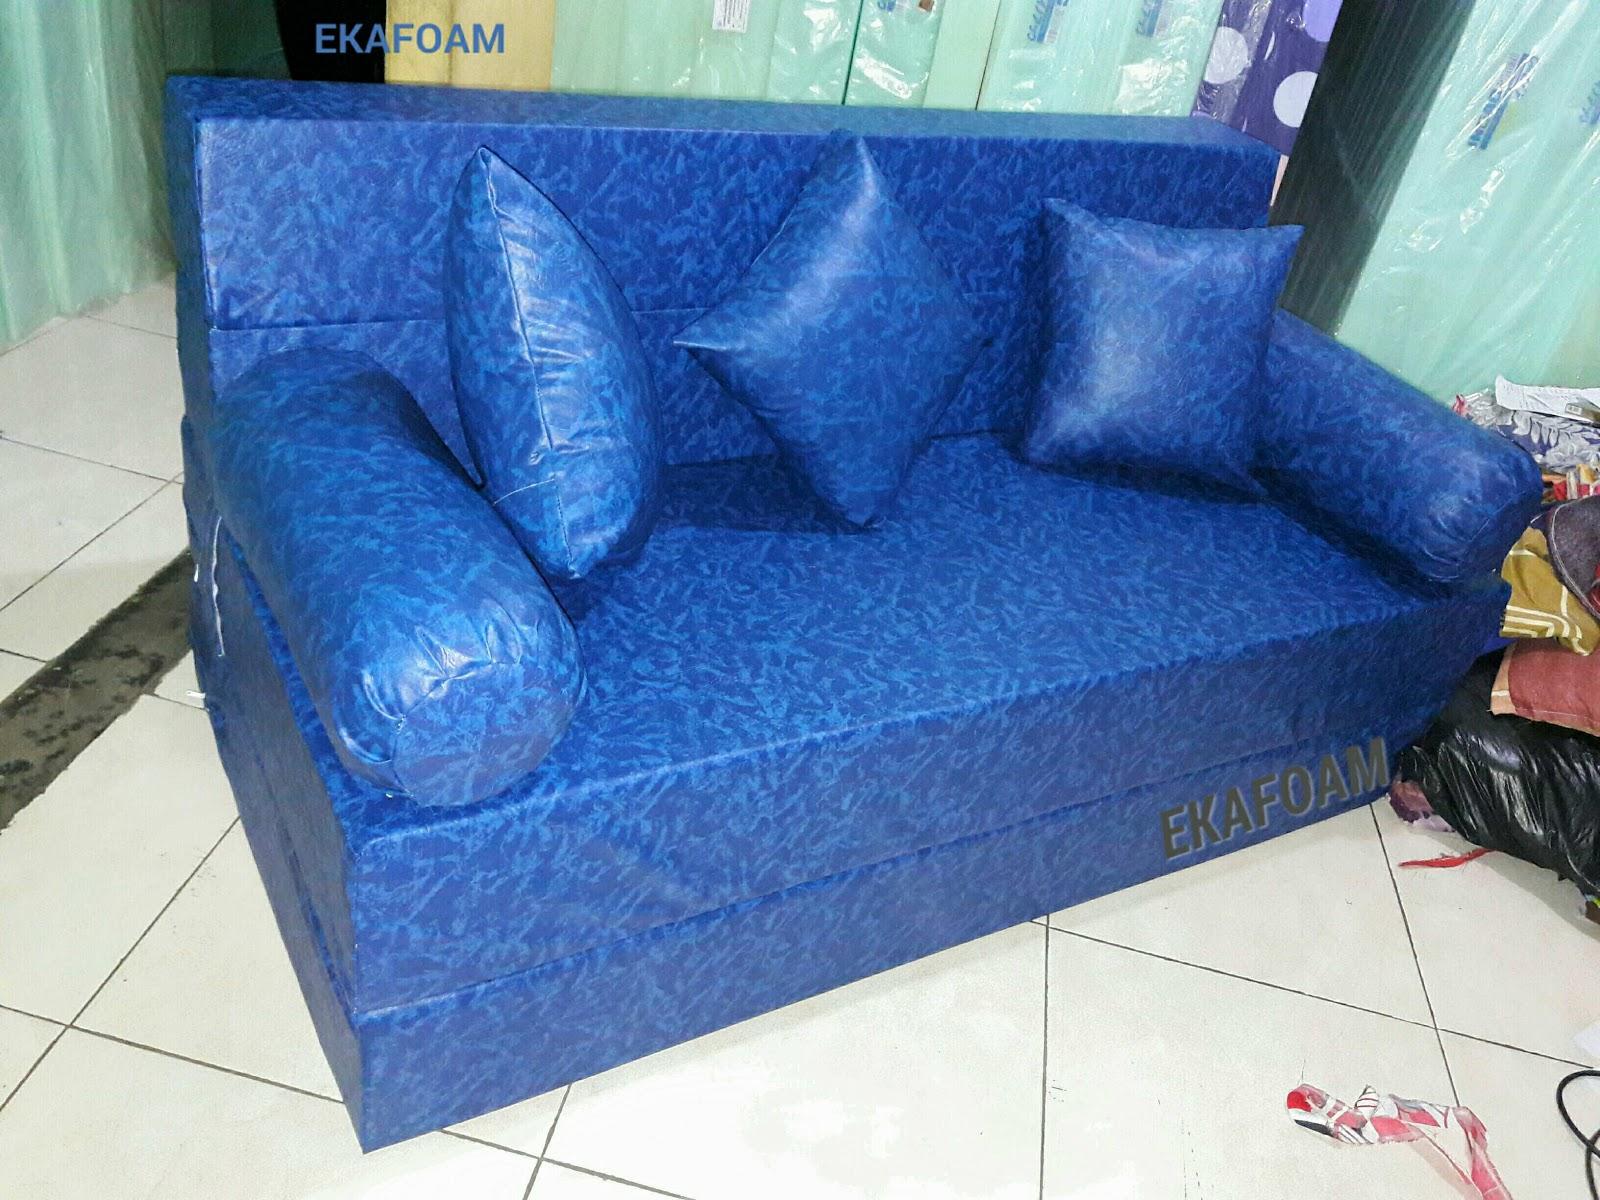 harga sofa bed inoac cikarang best air mattress for sleeper daftar kasur busa terbaru 2016 ekafoam